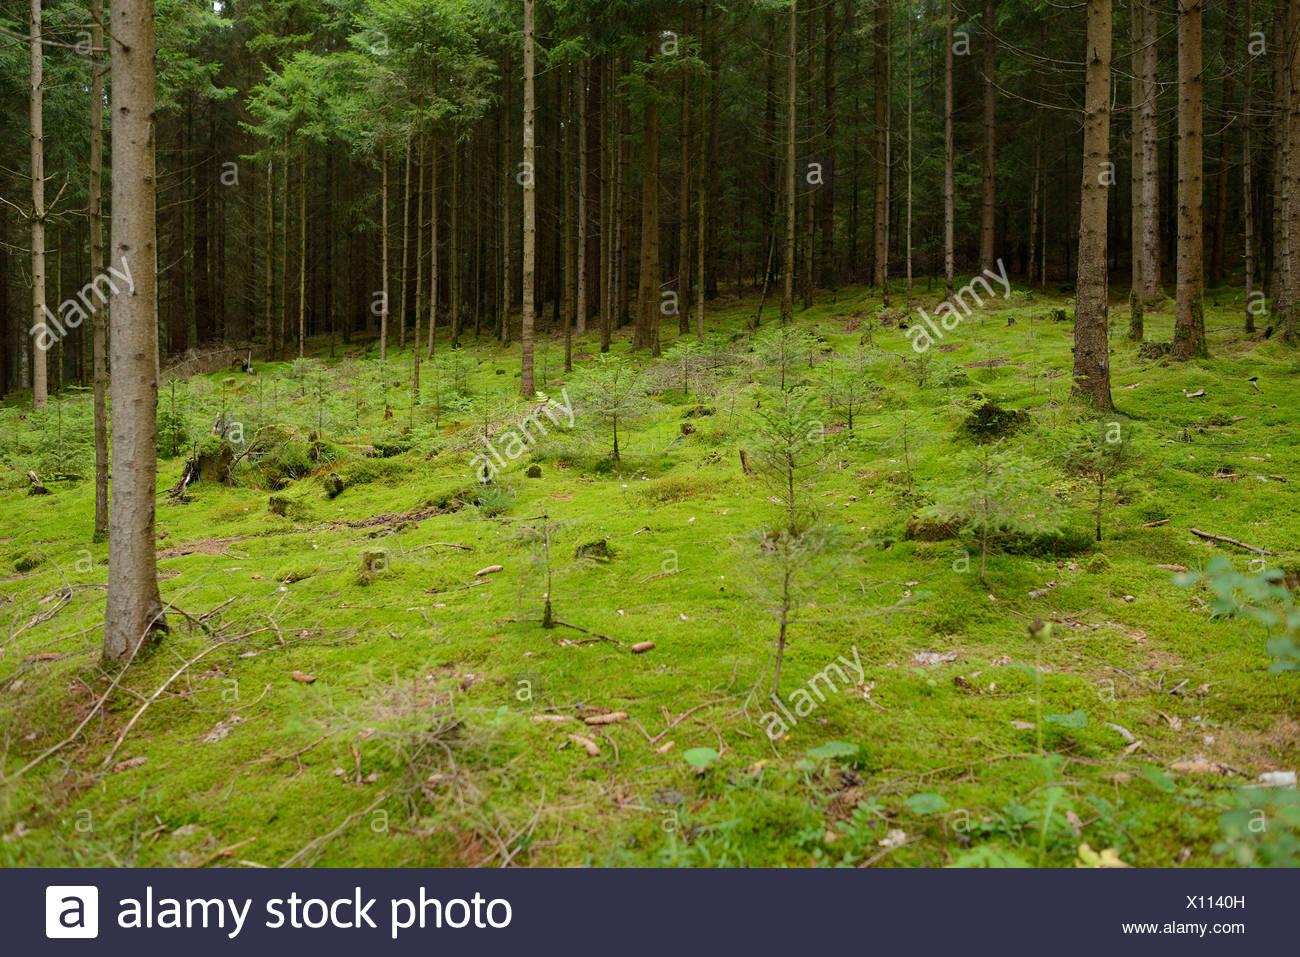 Conifer forest, Upper Palatinate, Bavaria, Germany - Stock Image